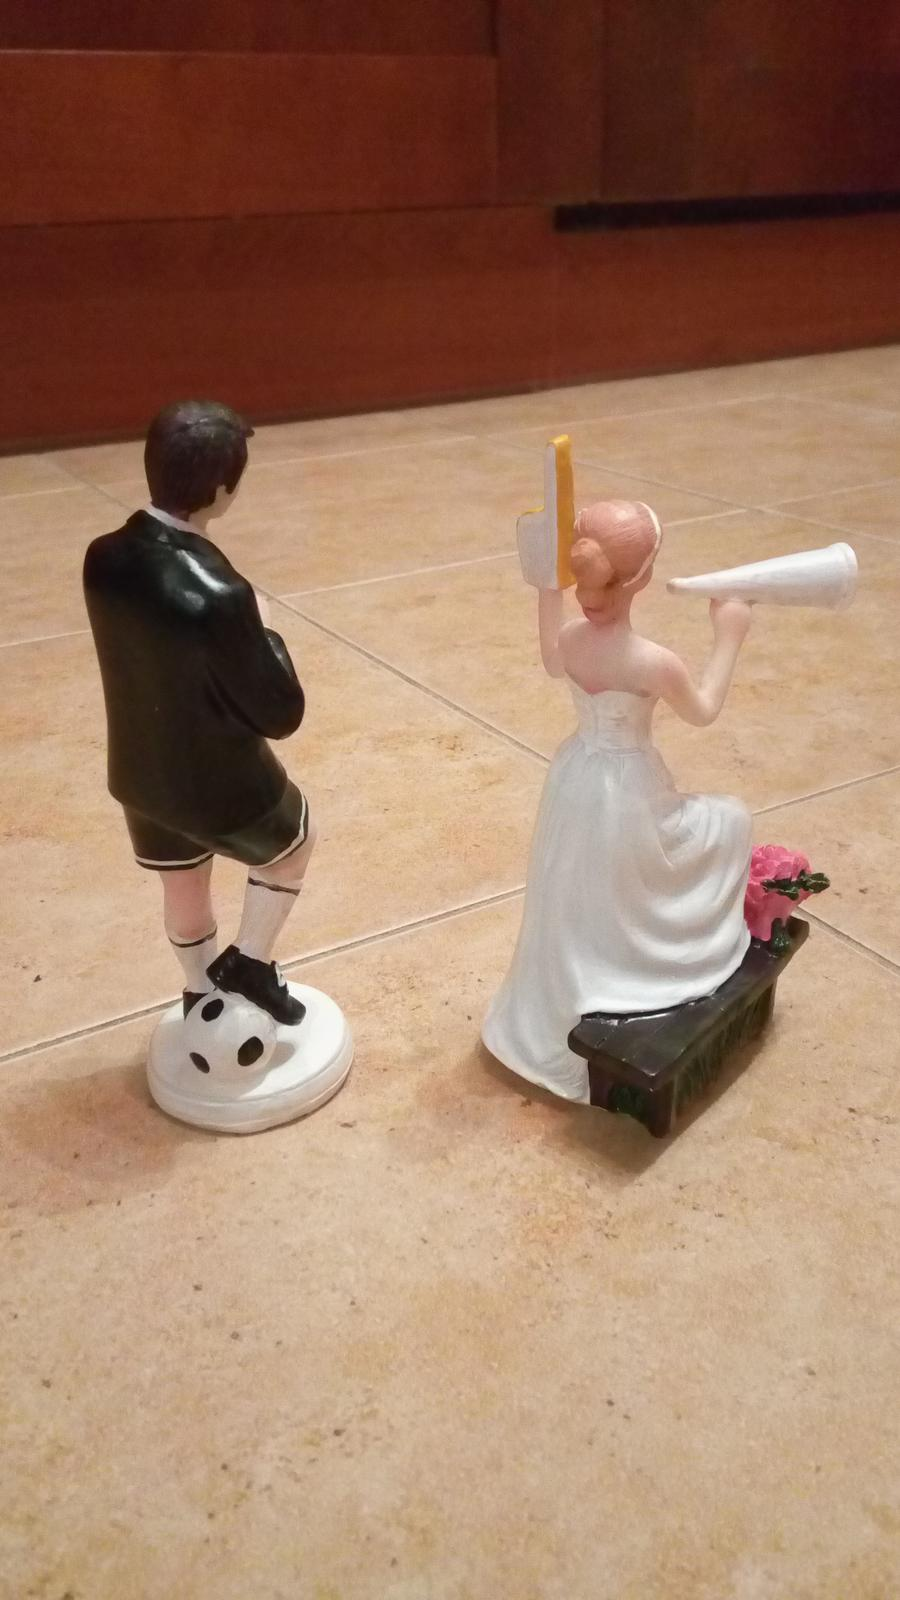 2ks figurky na tortu pre futbalistu - rozhodcu - Obrázok č. 1